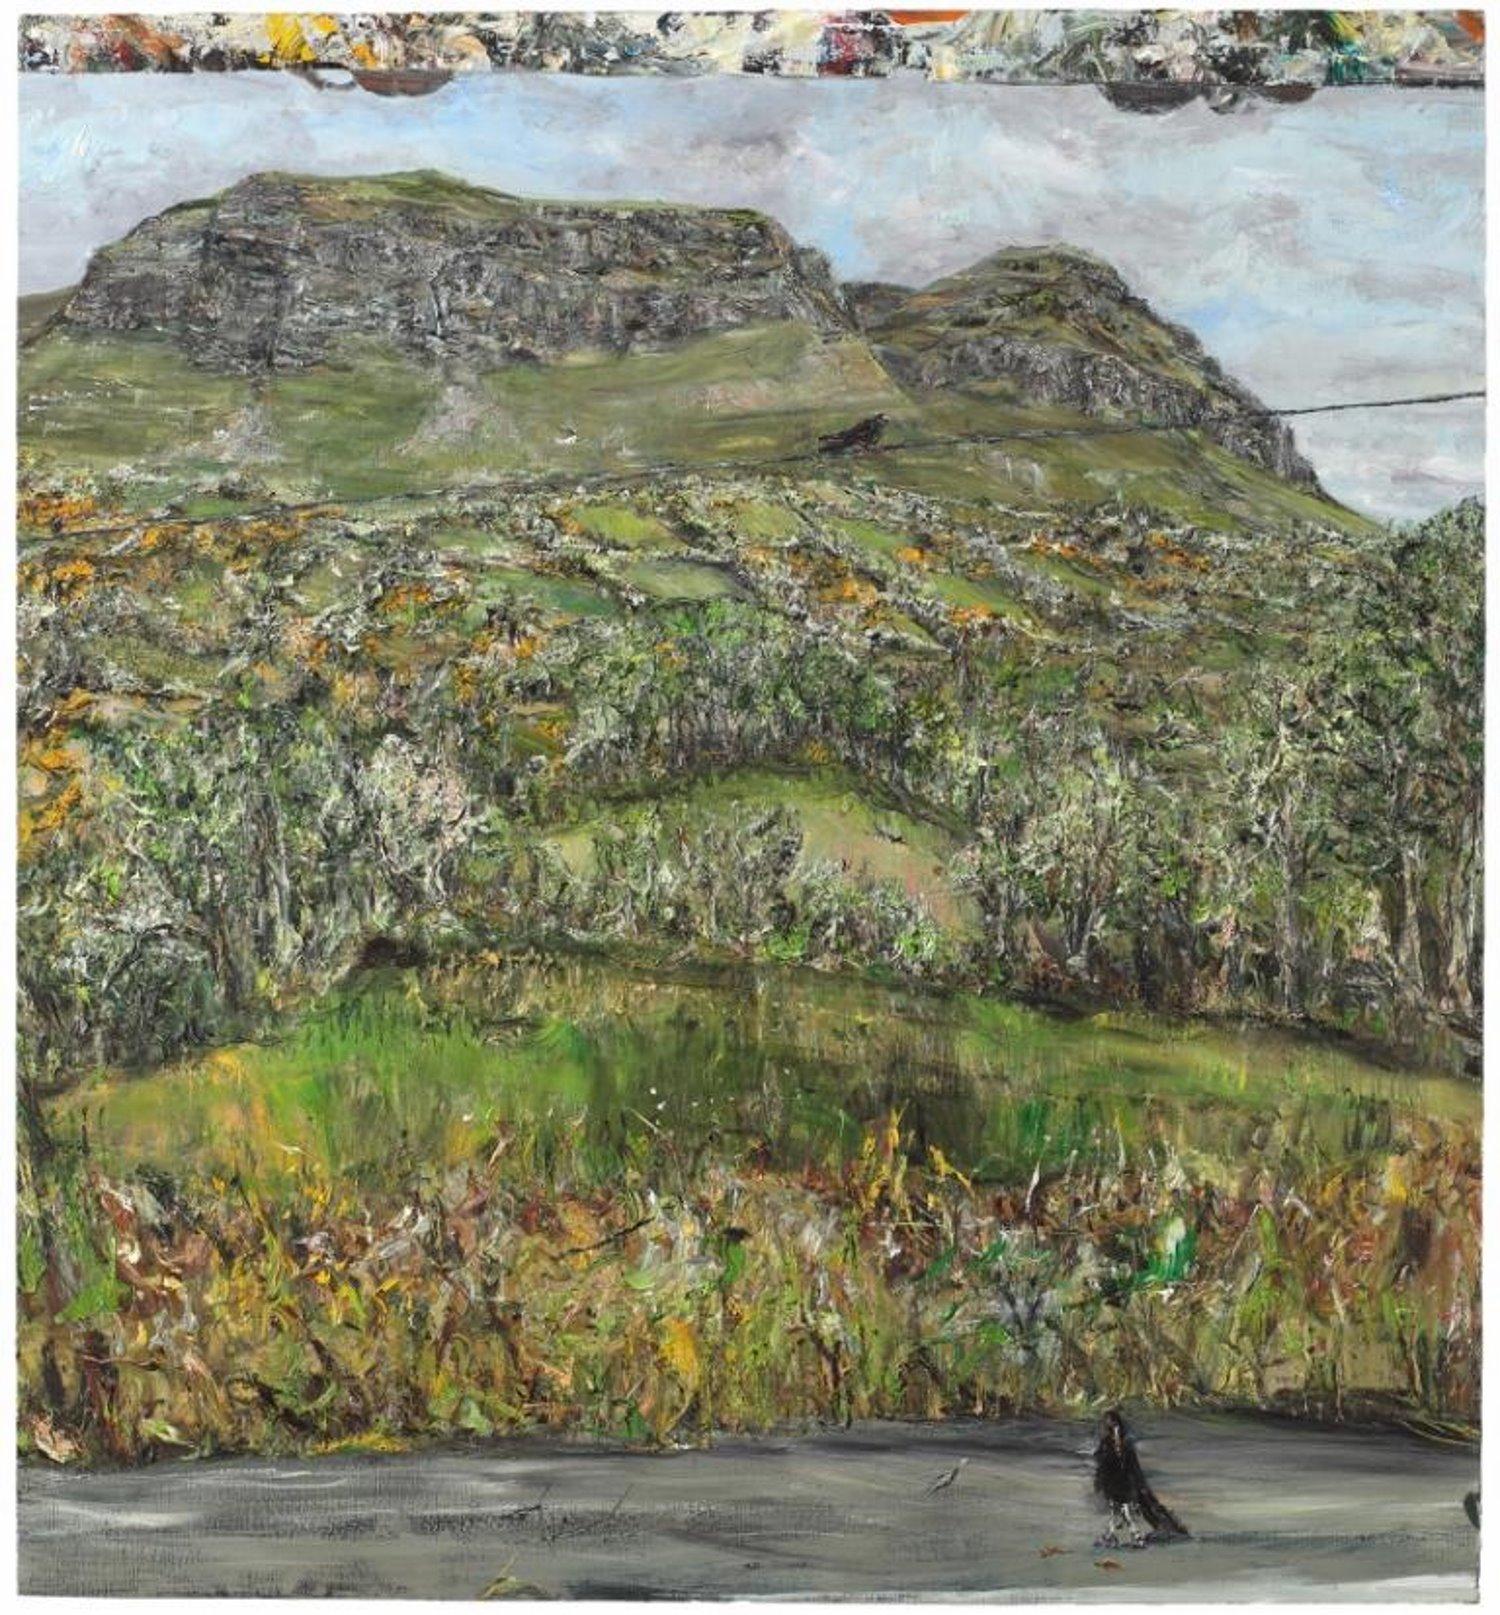 Benbulben crags with birds